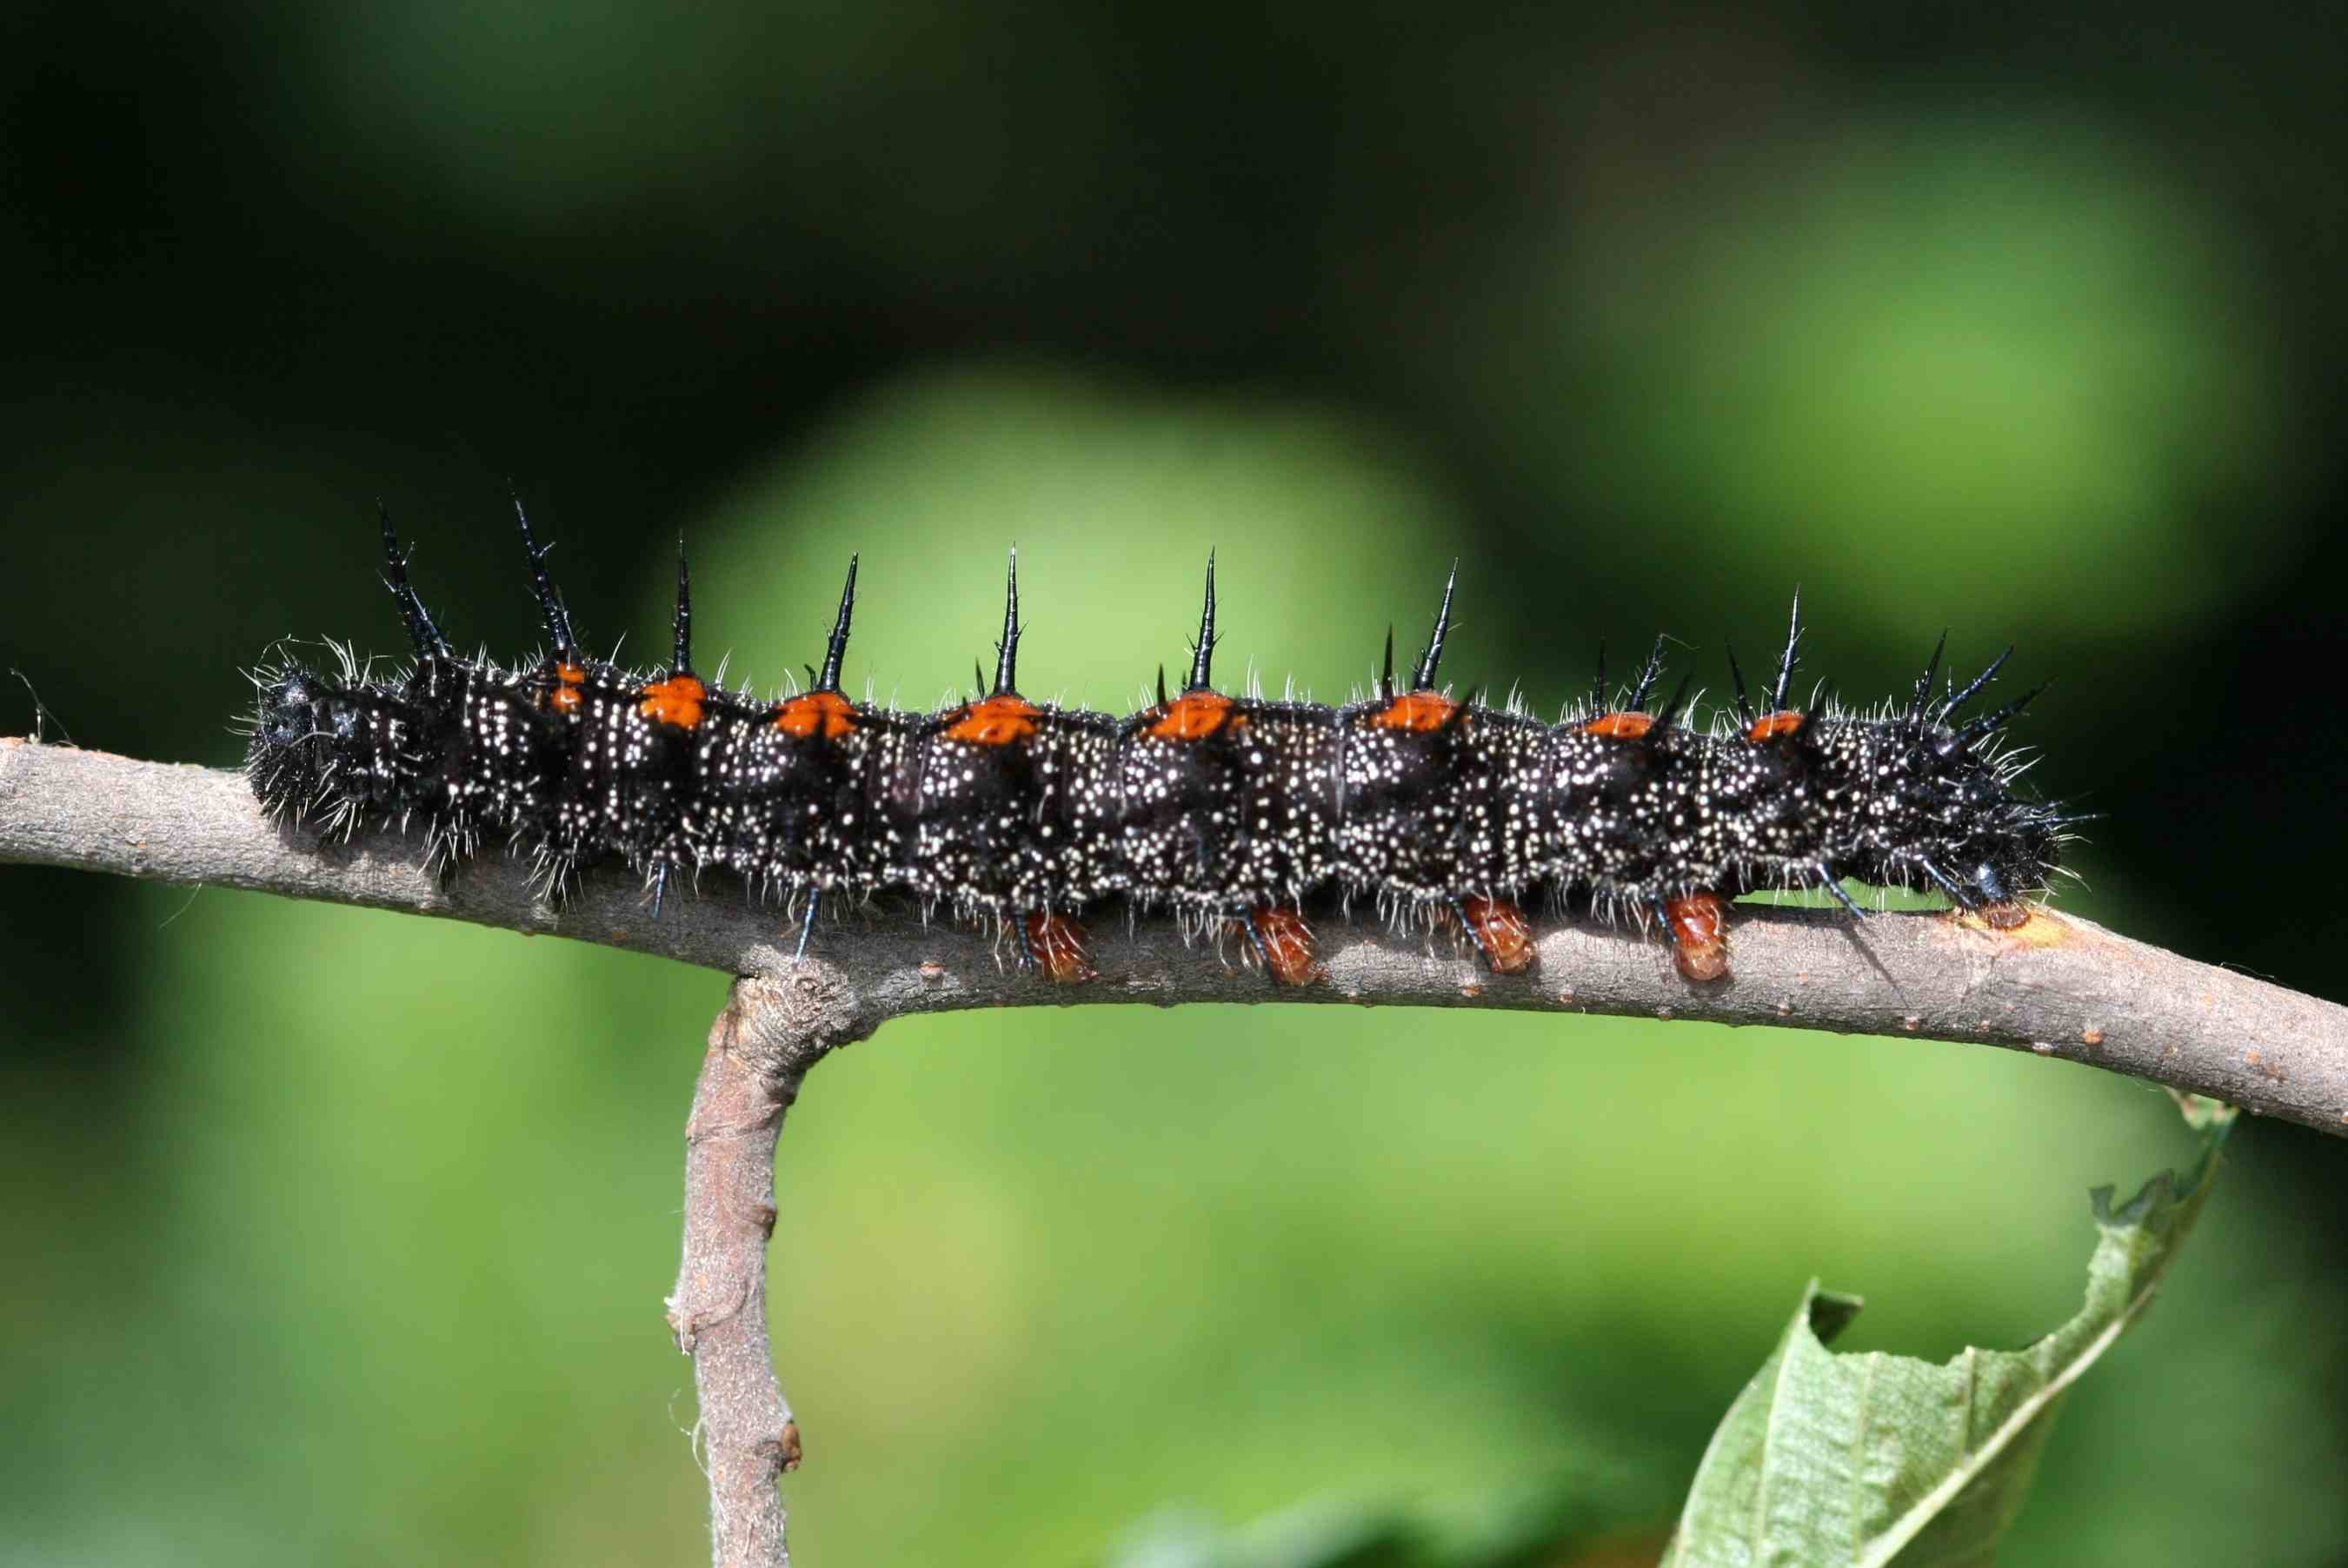 Do Caterpillars Bite or Sting?